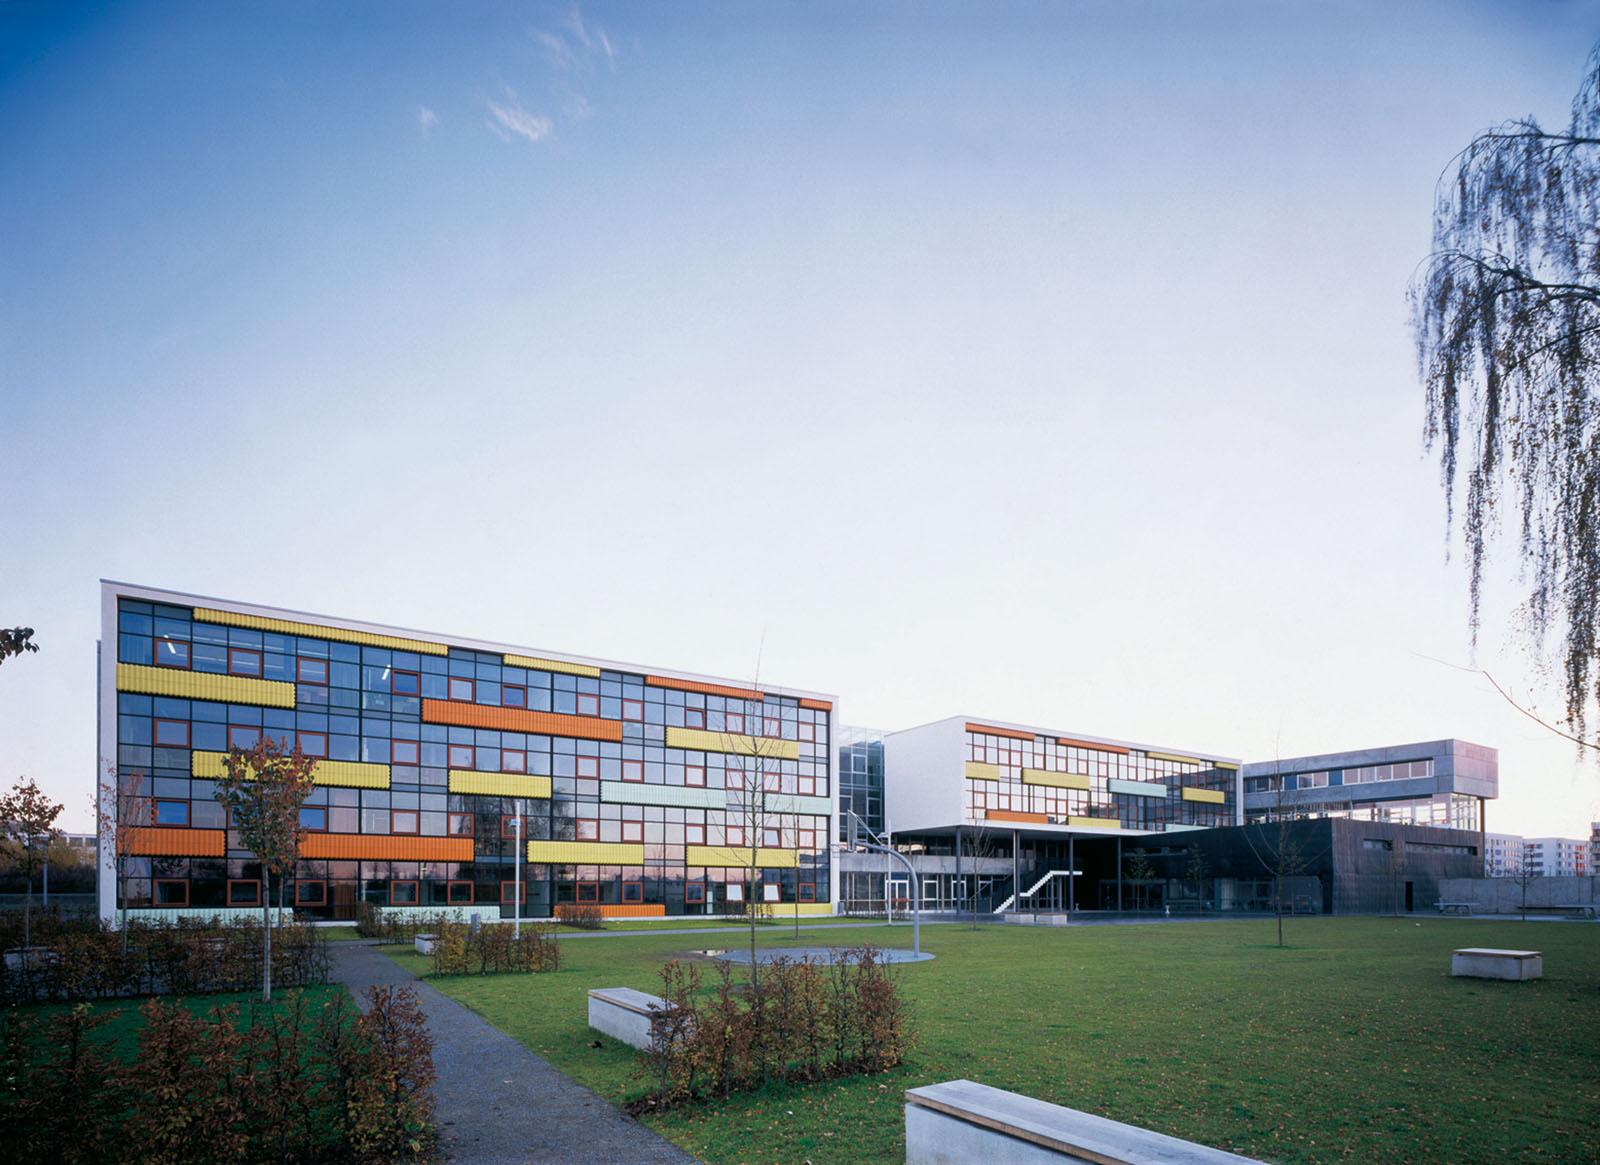 Hannah-Arendt-Gymnasium, Berlin